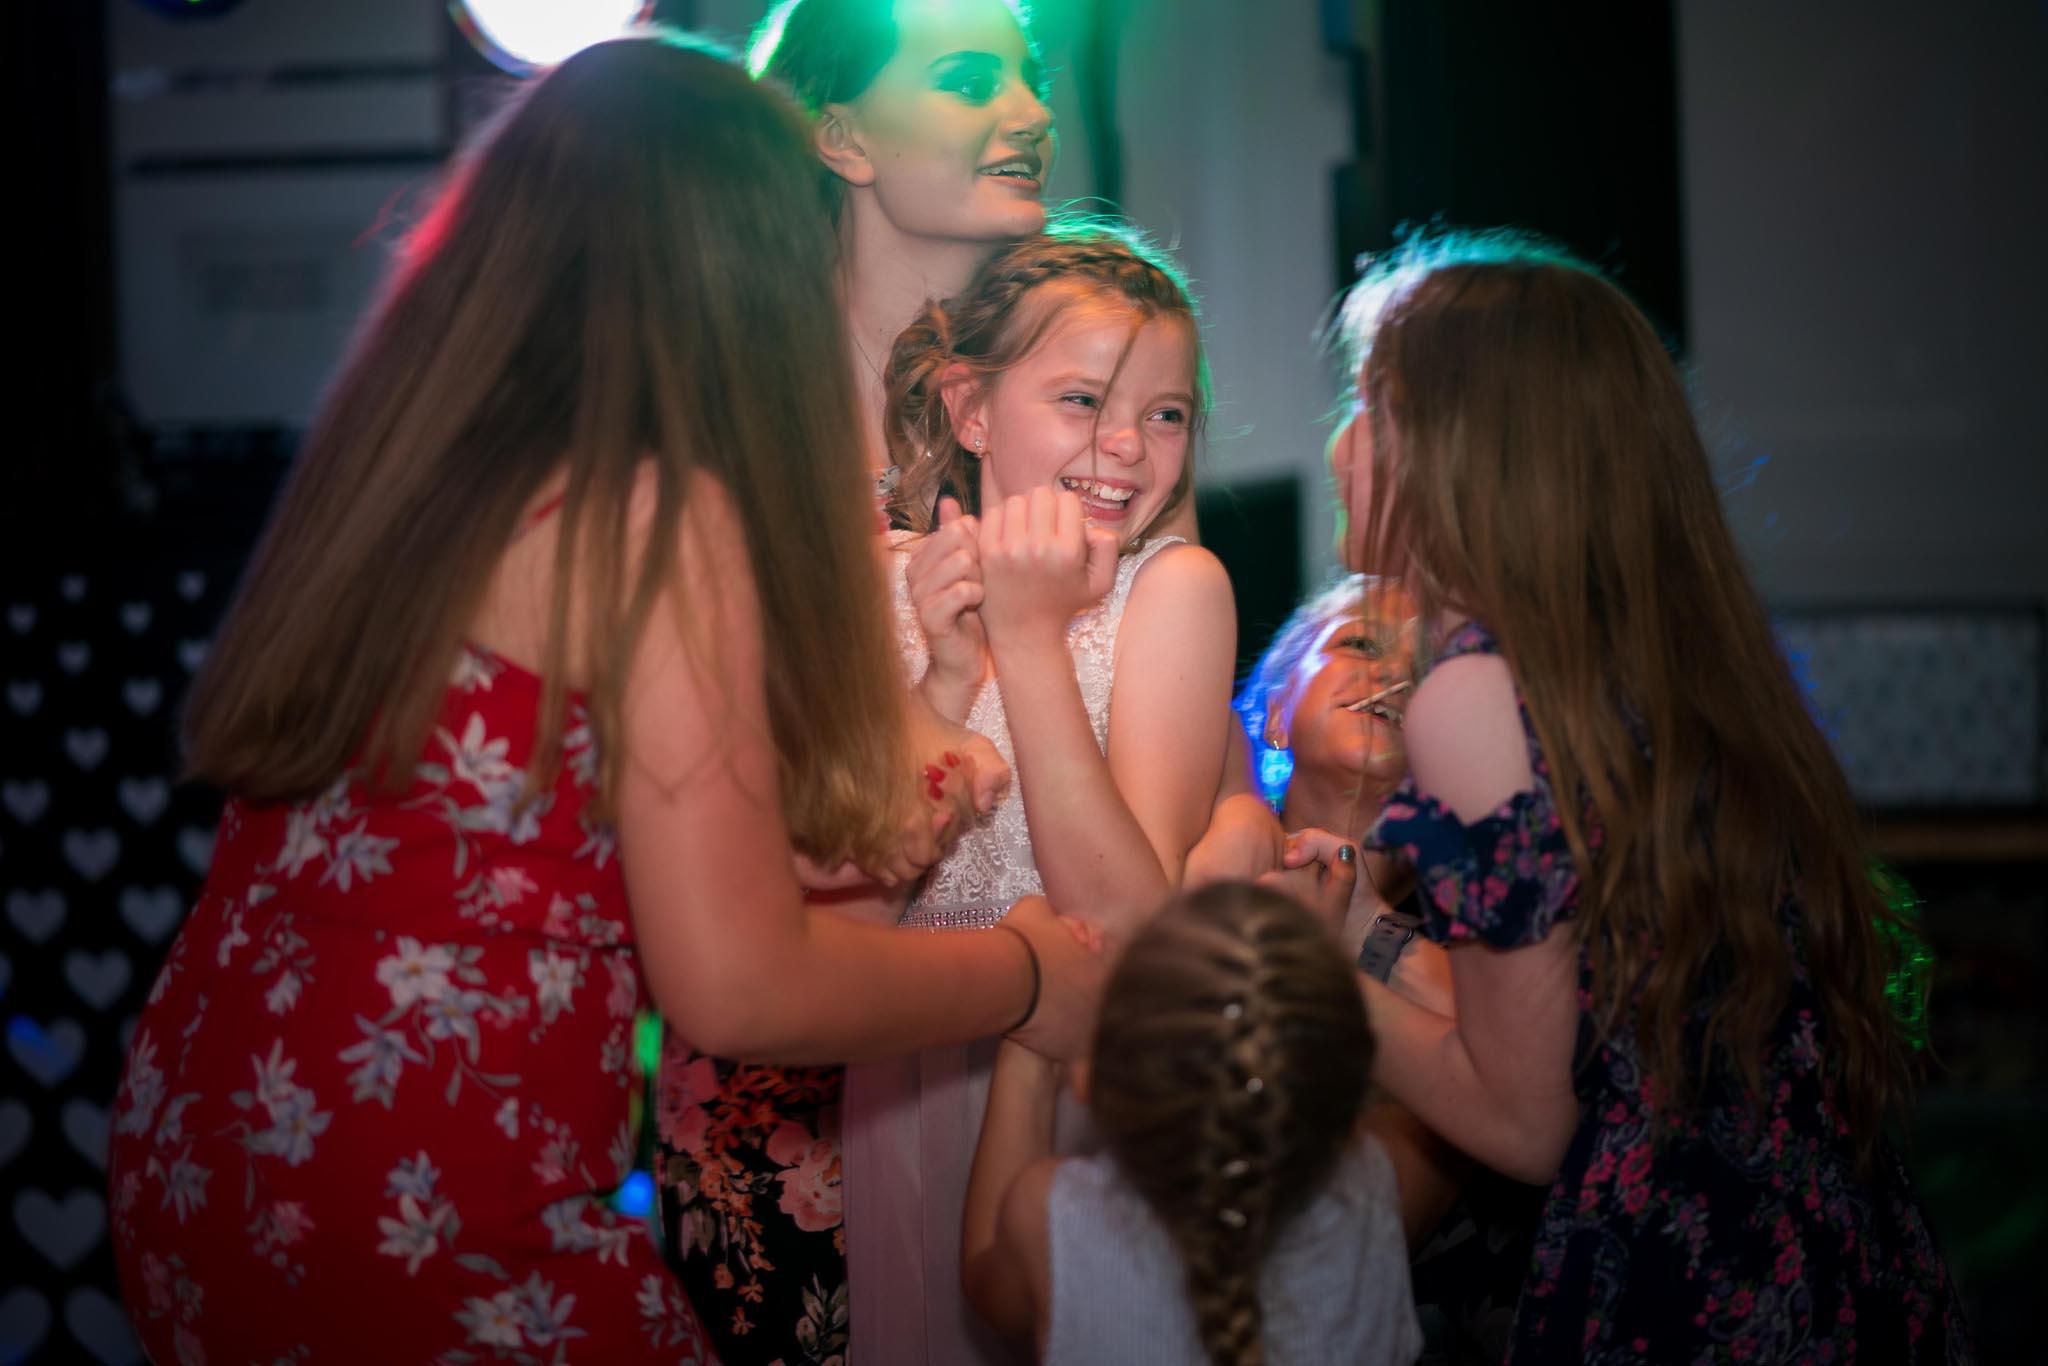 970-Night-Reception-Luke-Yasmin-The-Rayleigh-Club-Wedding-Photography.jpg